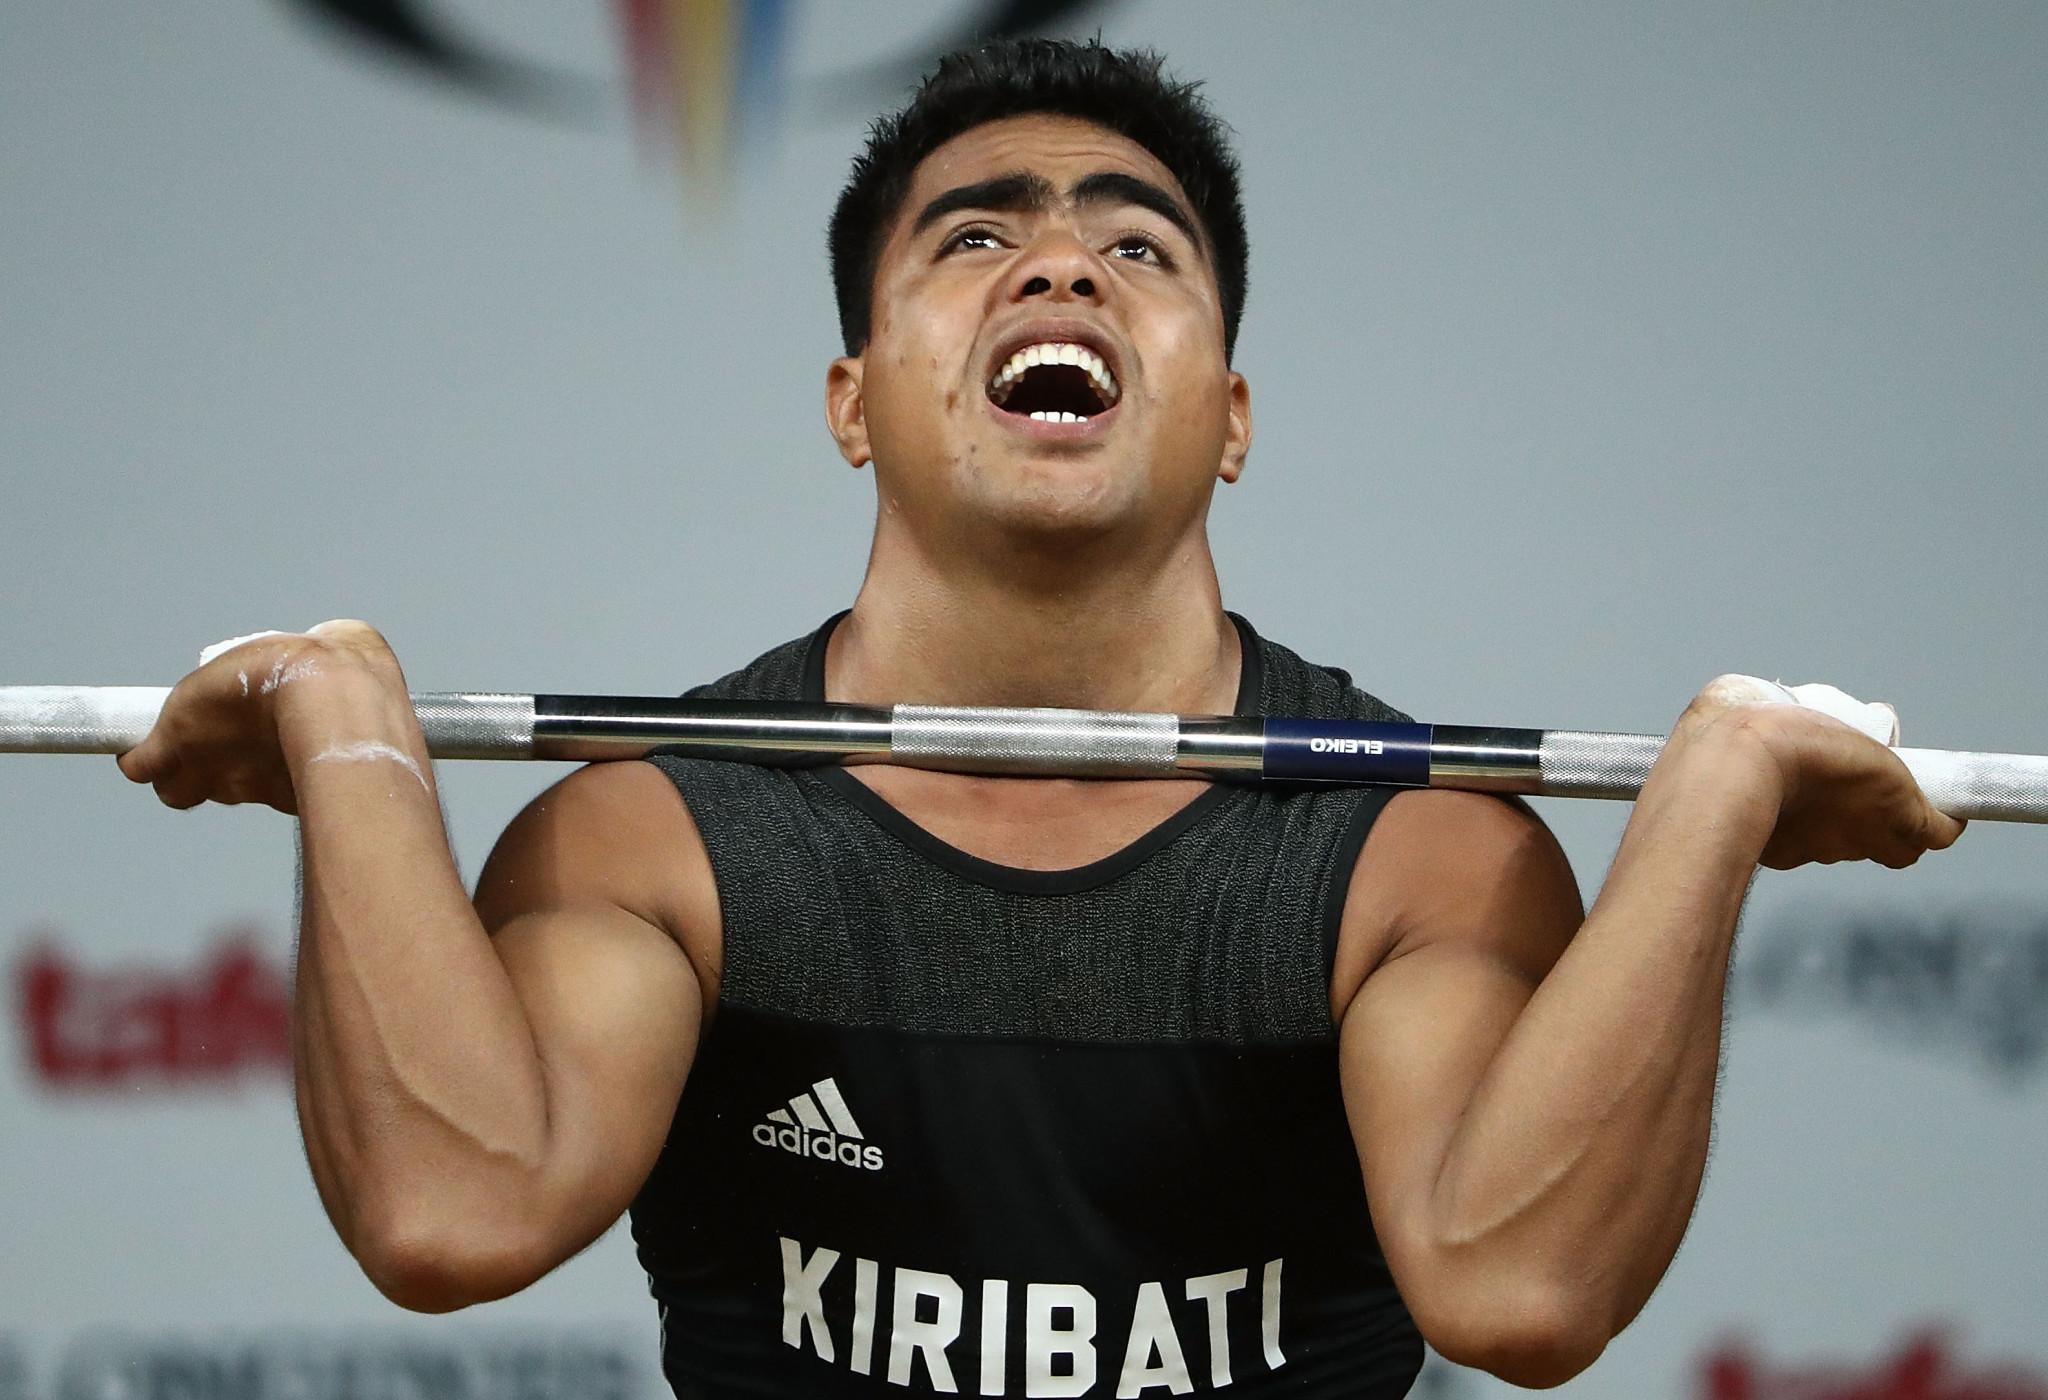 Ruben Katoatau of Kiribati is among other gold medal winners so far ©Getty Images